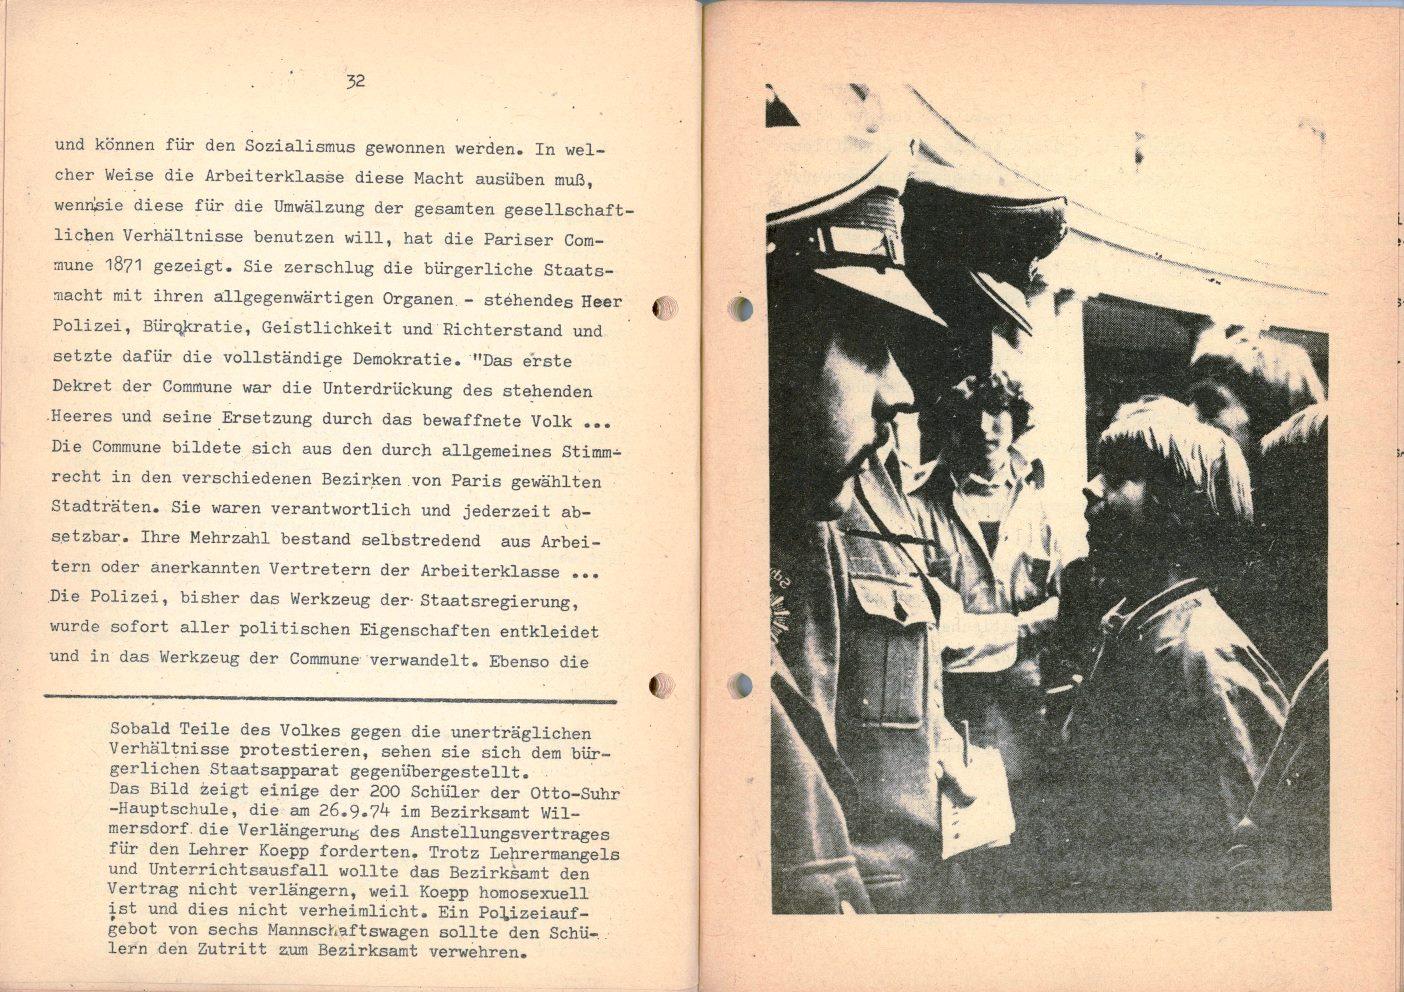 Berlin_SMV_GUV_1974_Schulmisere_19